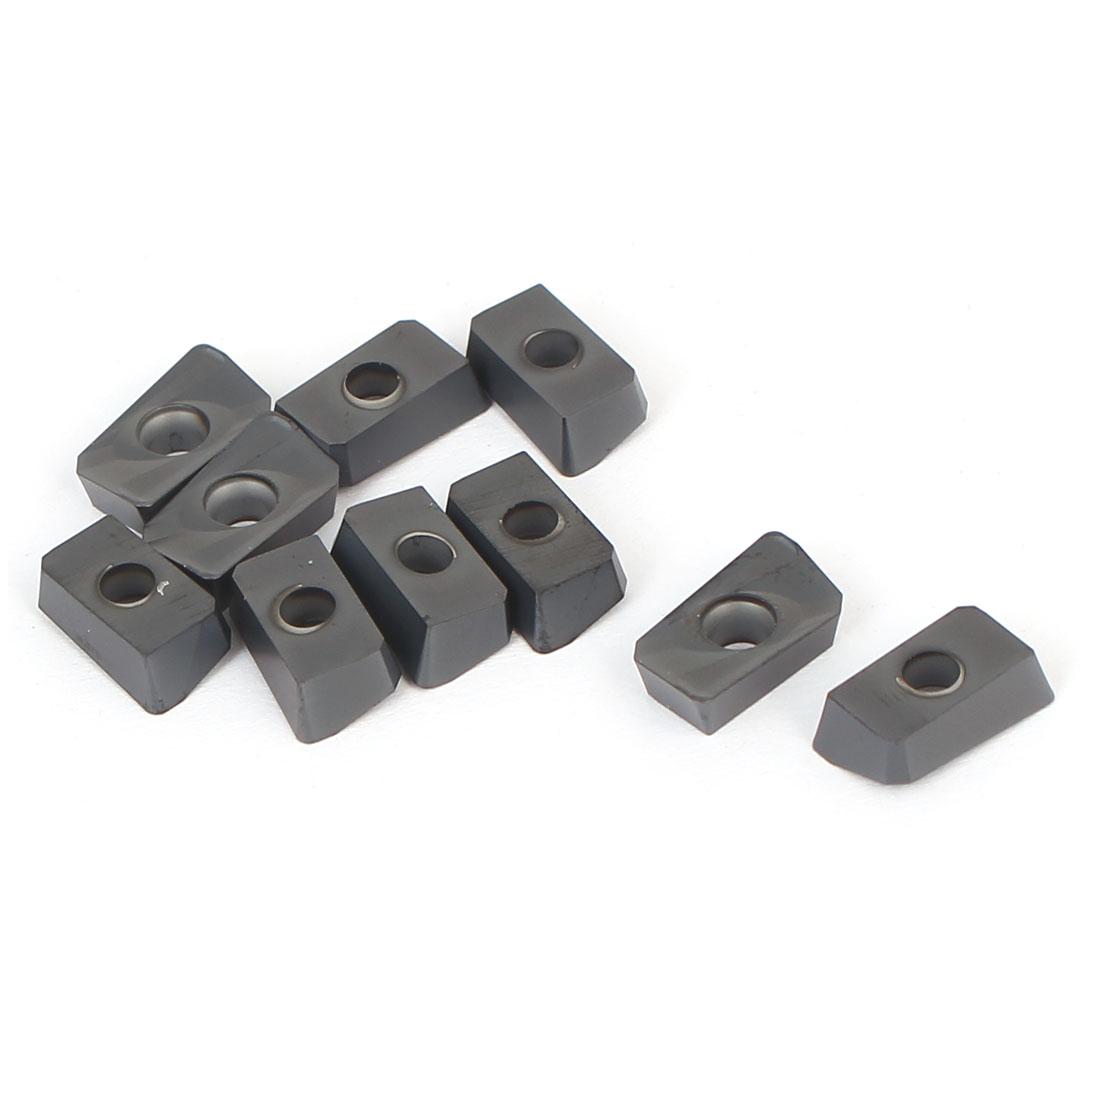 Machine Lathe Milling Tool Rectangle Carbide Turning Insert 11mm Long 10pcs